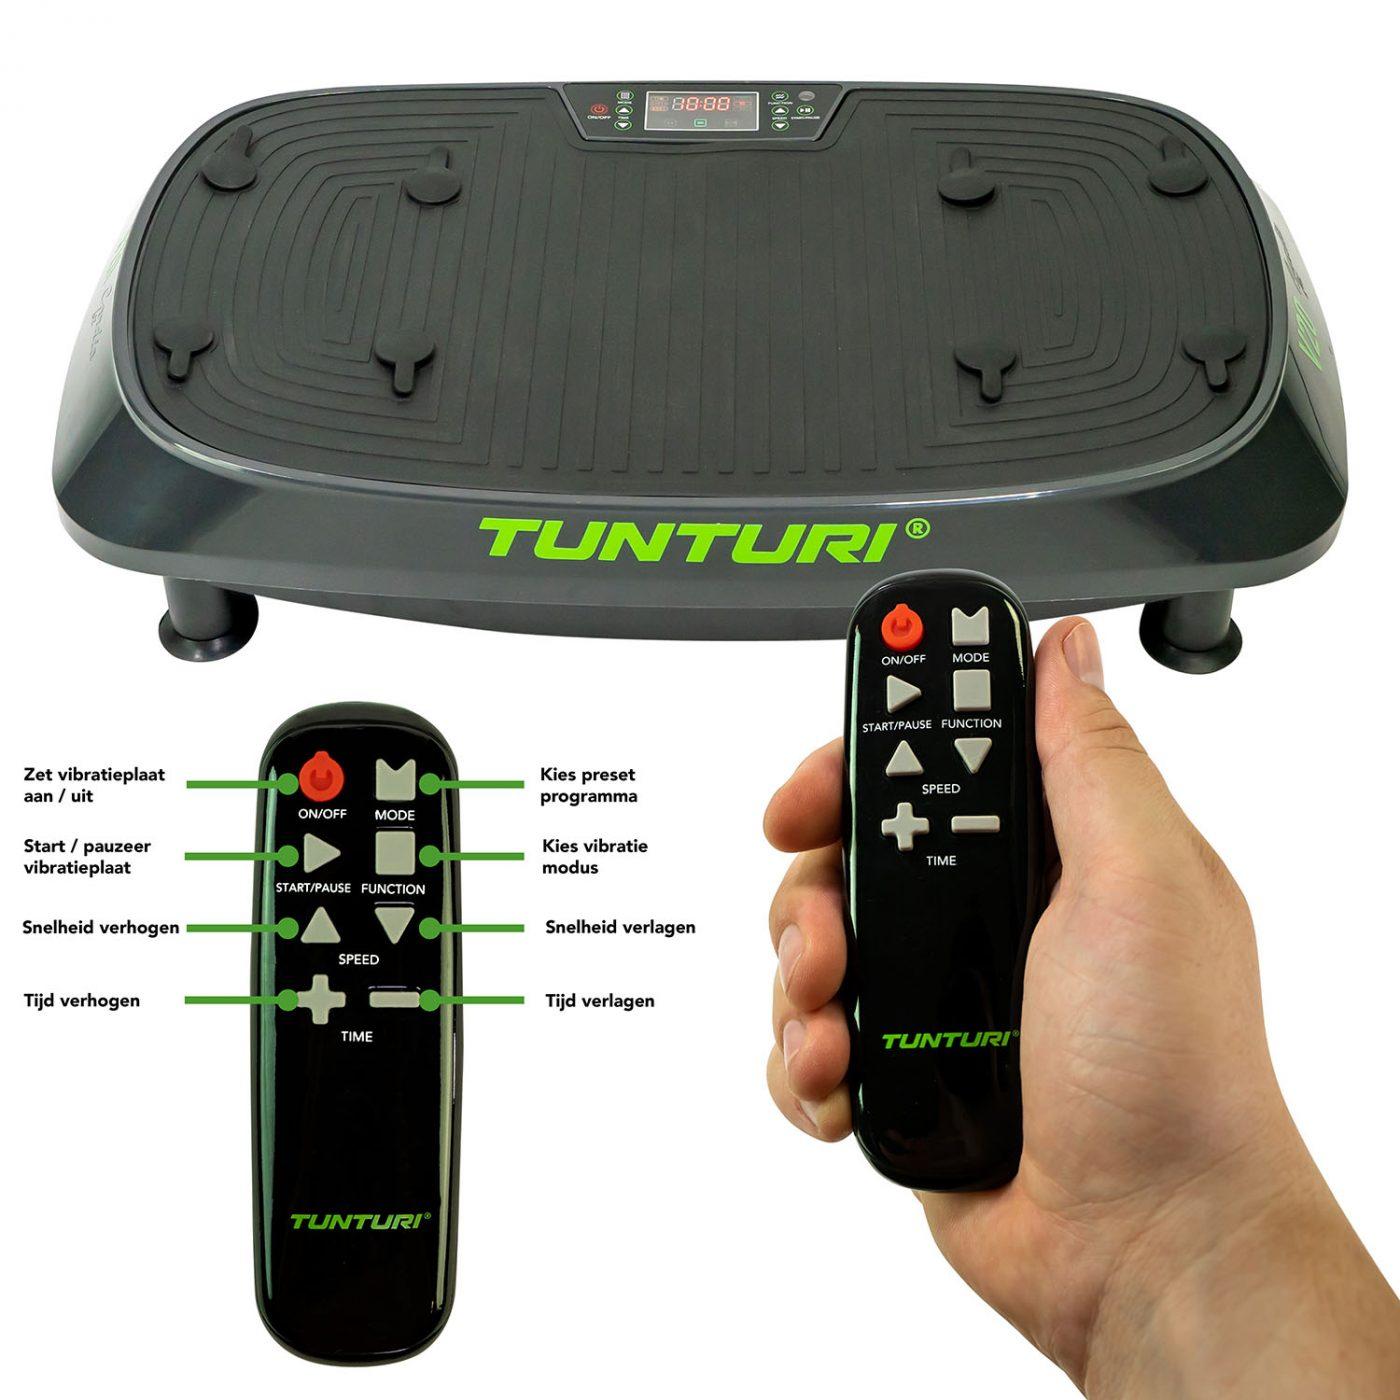 Tunturi Cardio Fit V20 Trilplaat - Vibration plate